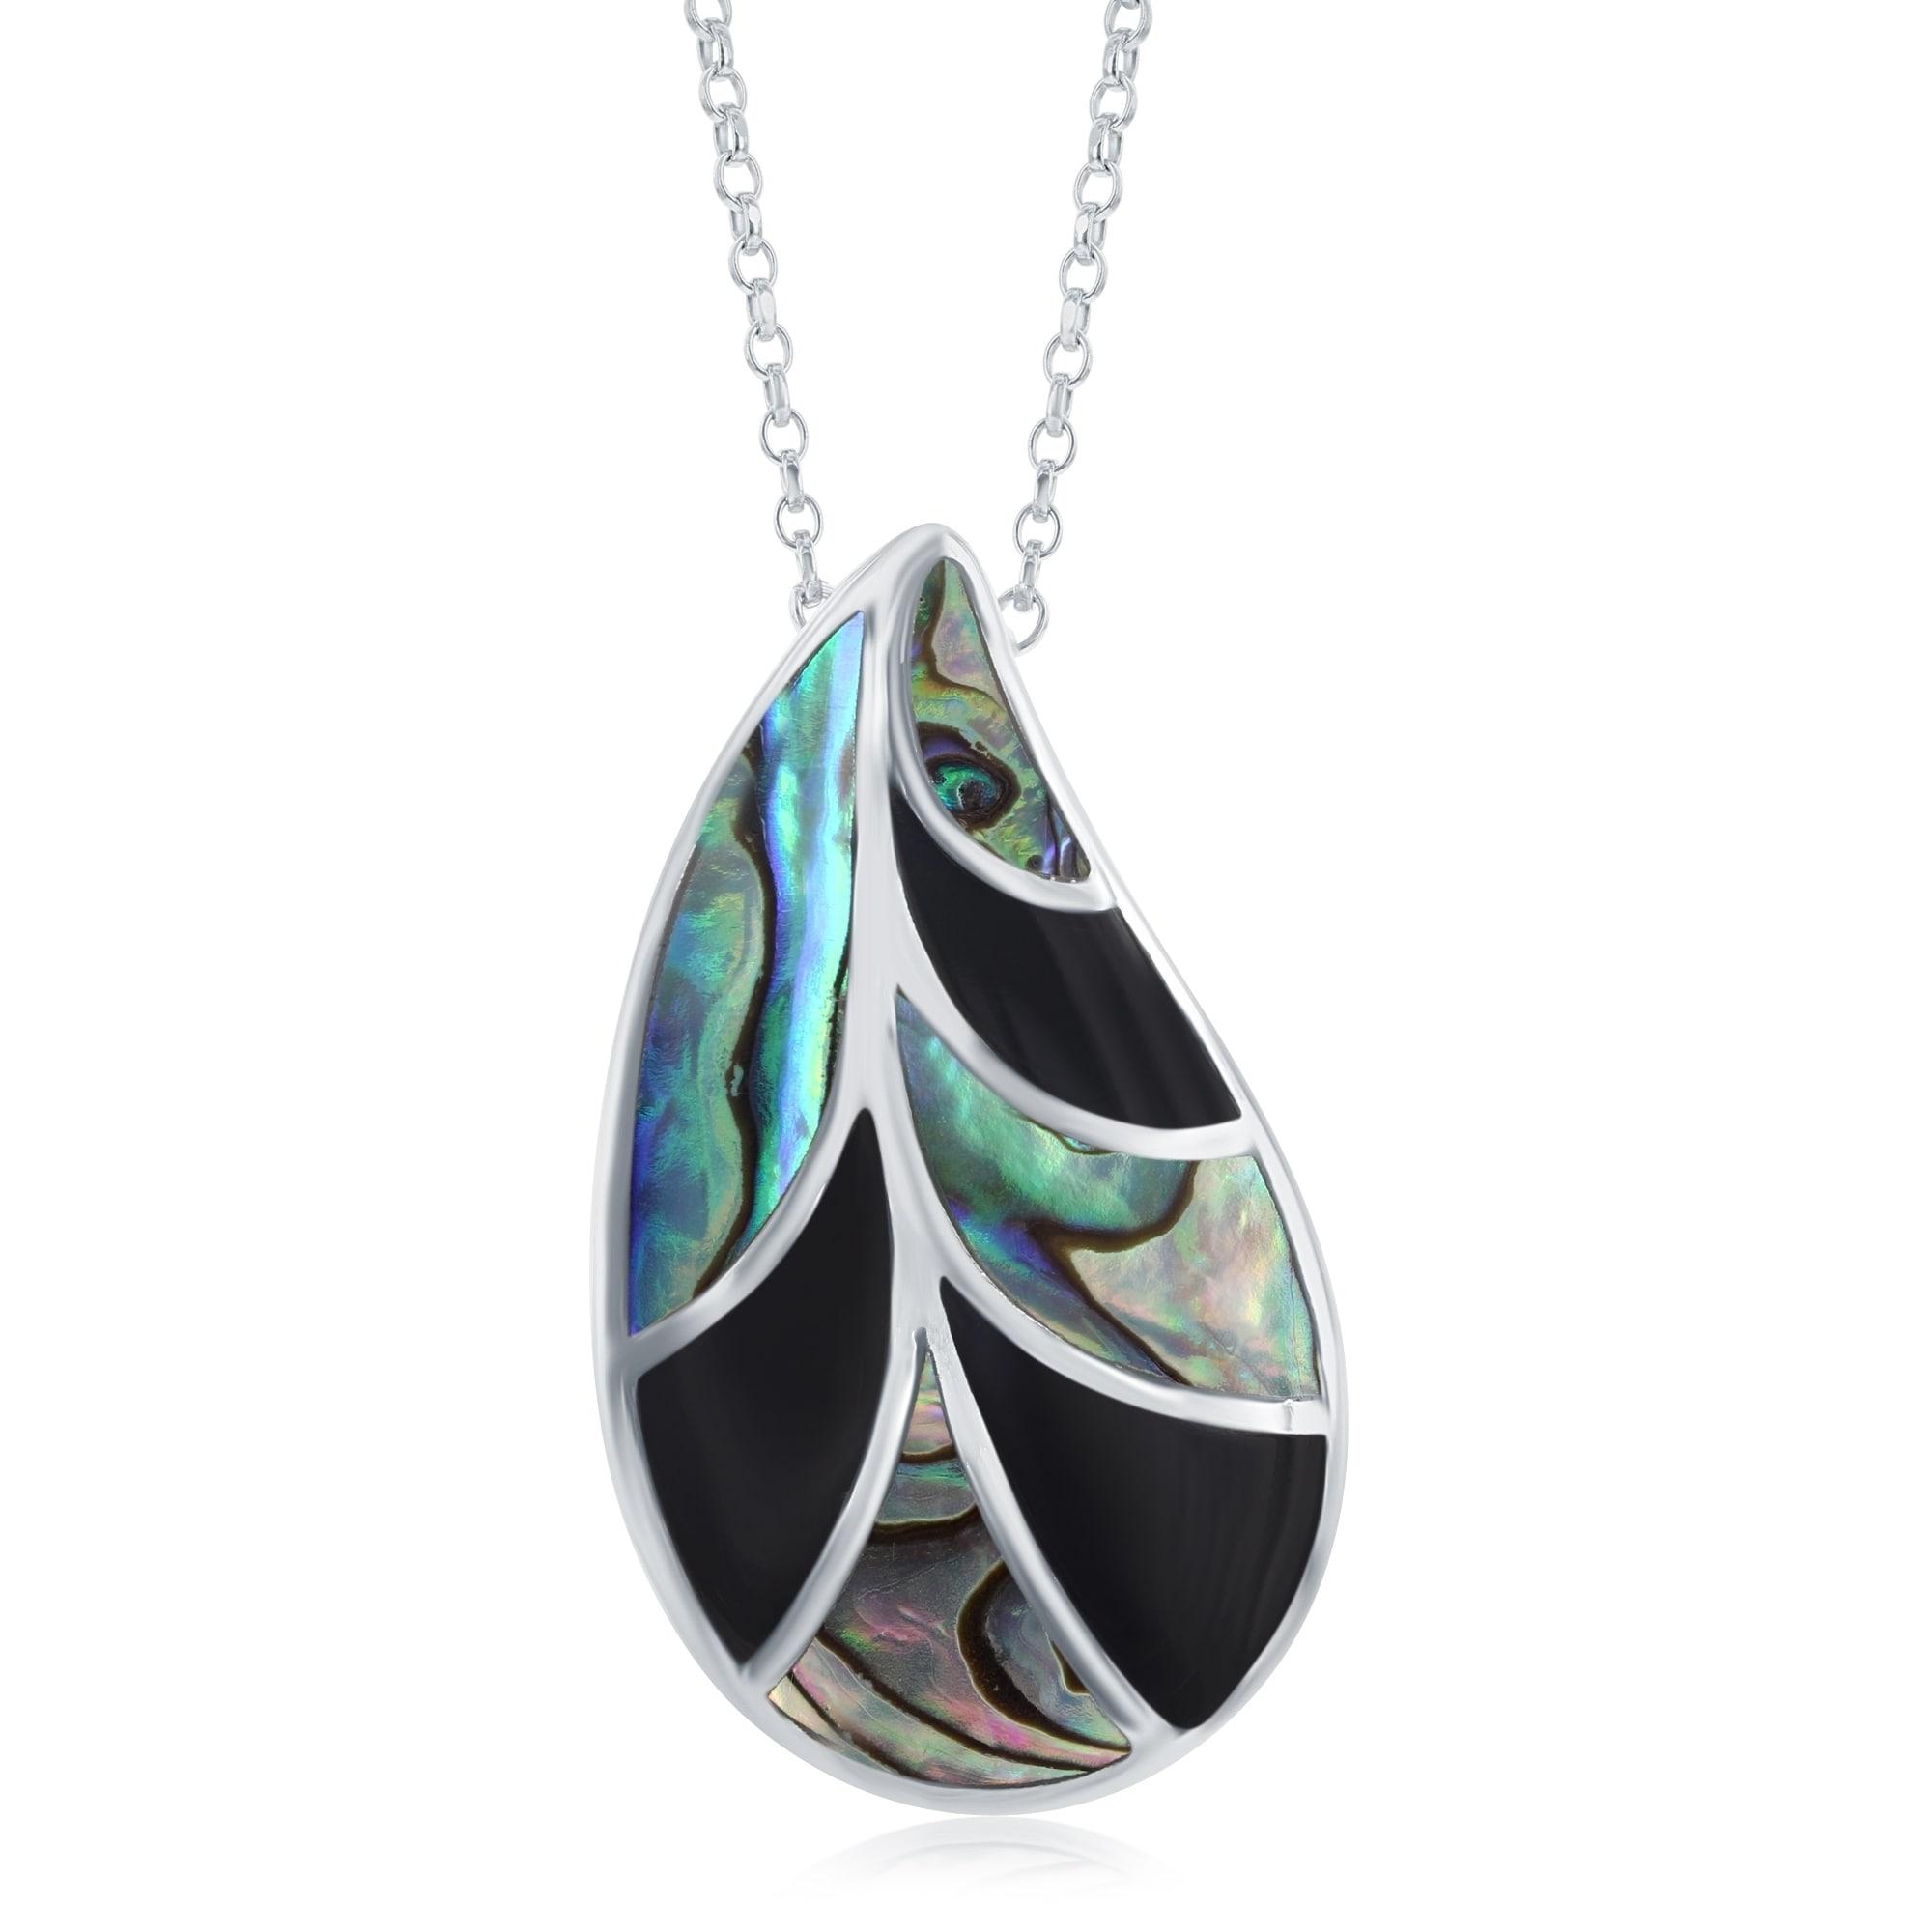 Sterling Silver Natural Carved Black Onyx Pendant Necklace STERLING SILVER 18 chain Carved Stone pendant Natural Stone black onyx Pendant